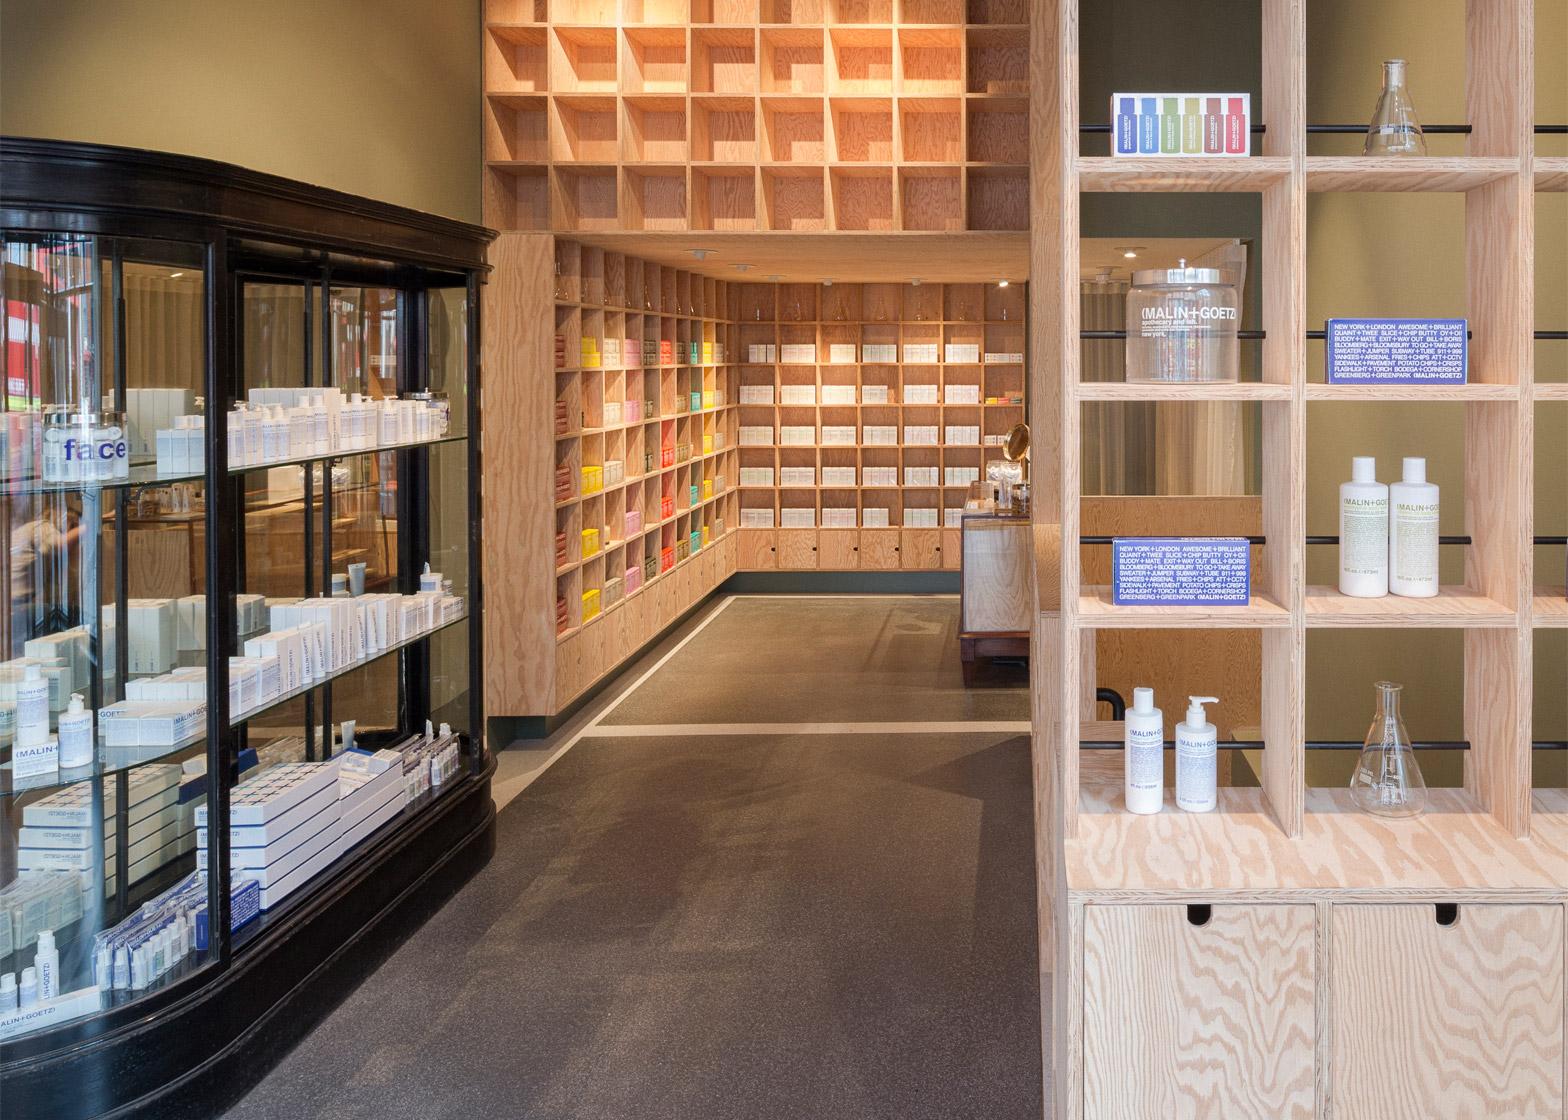 malingoetz-apothecary-shops-jonathan-tuckey-interior-london_dezeen_1568_5